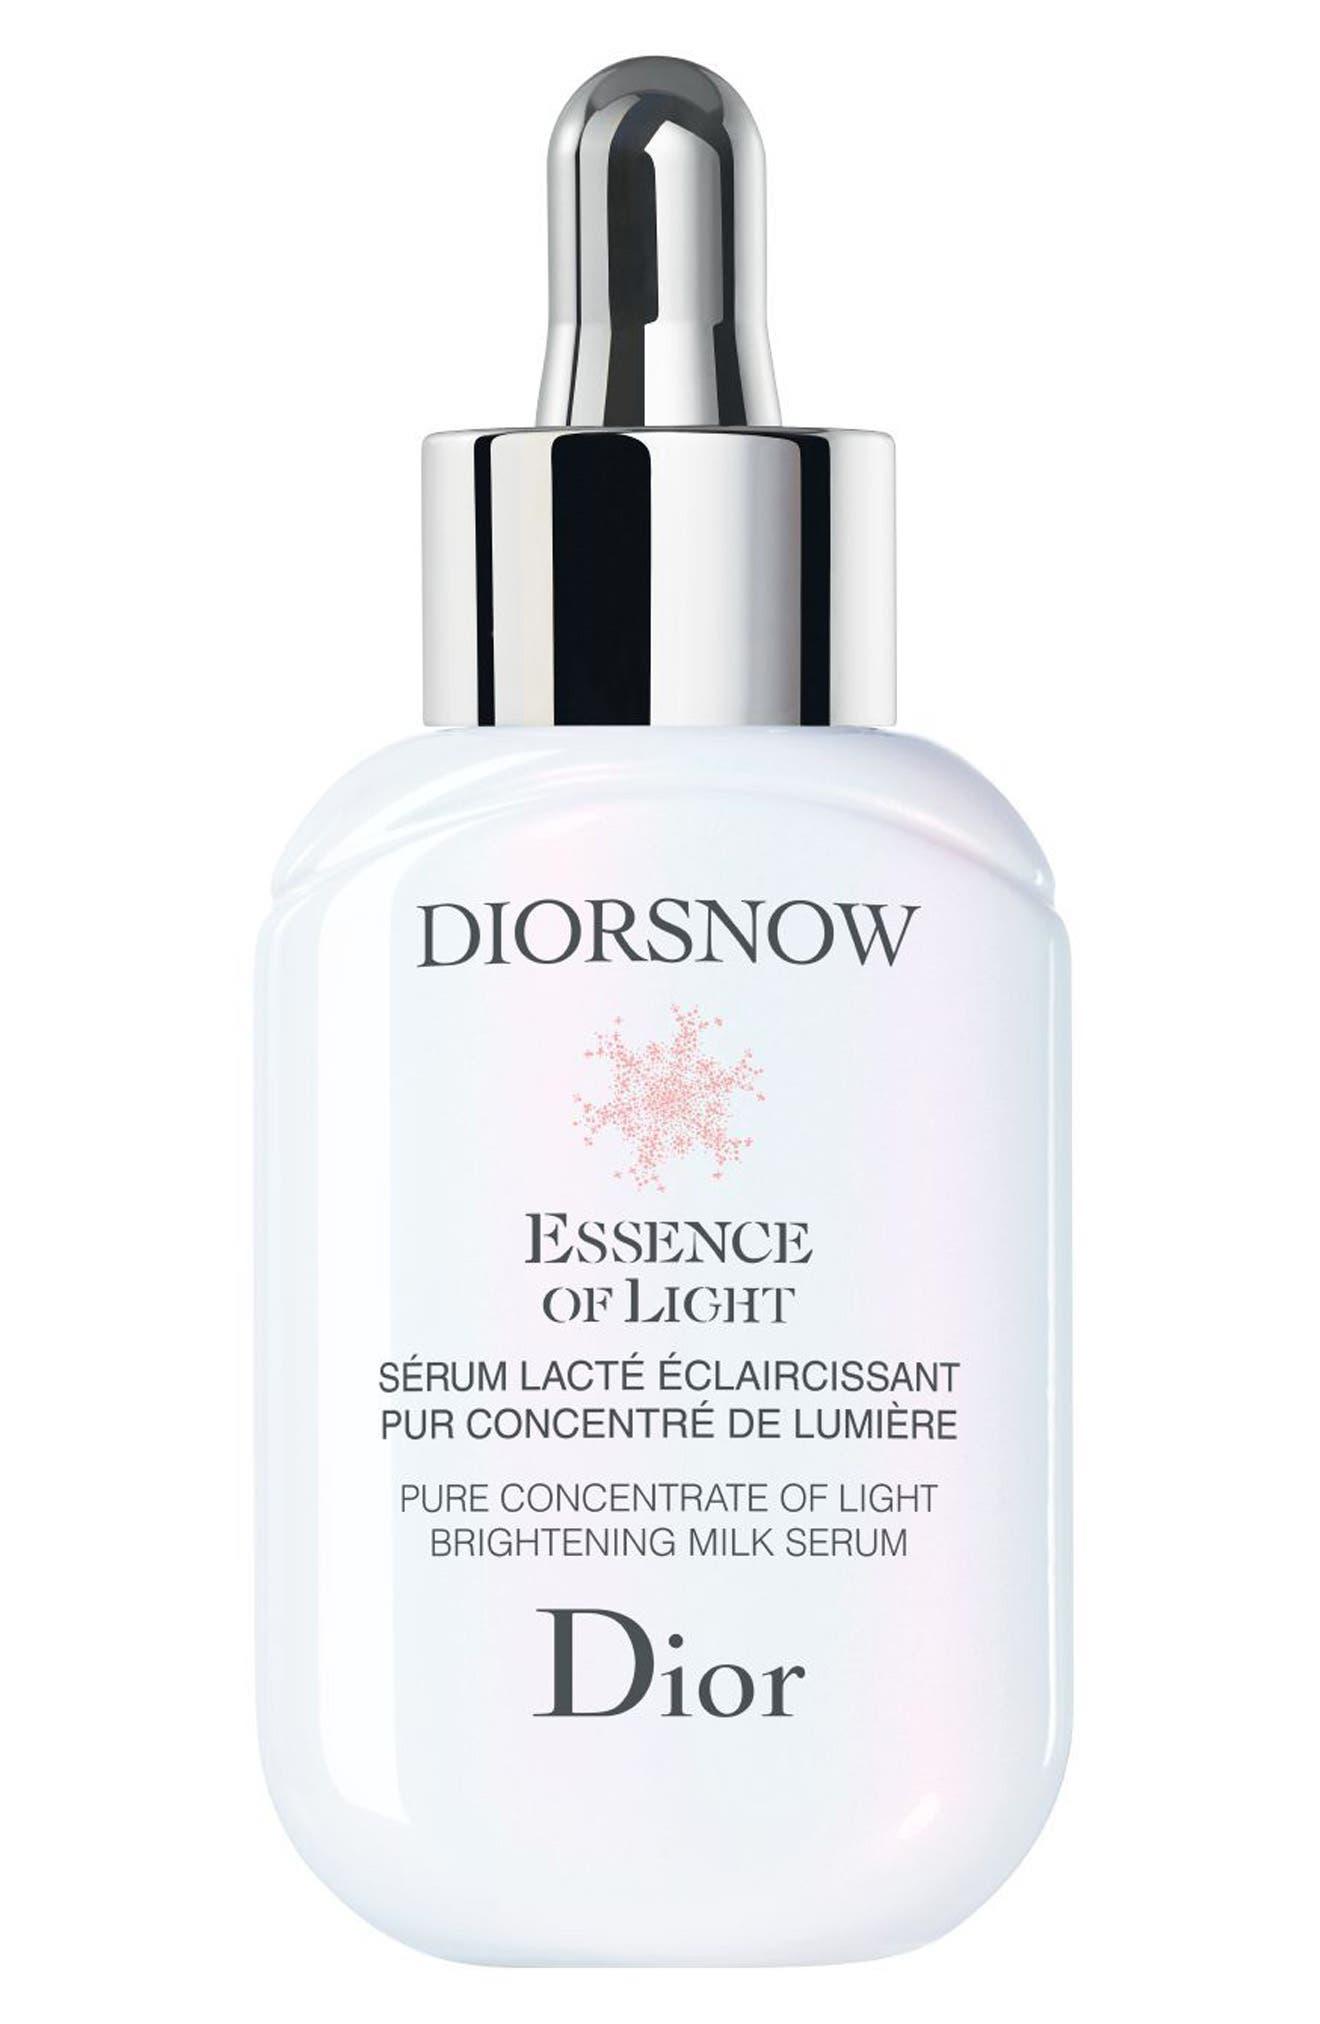 Diorsnow Essence of Light Brightening Milk Serum,                             Main thumbnail 1, color,                             NO COLOR